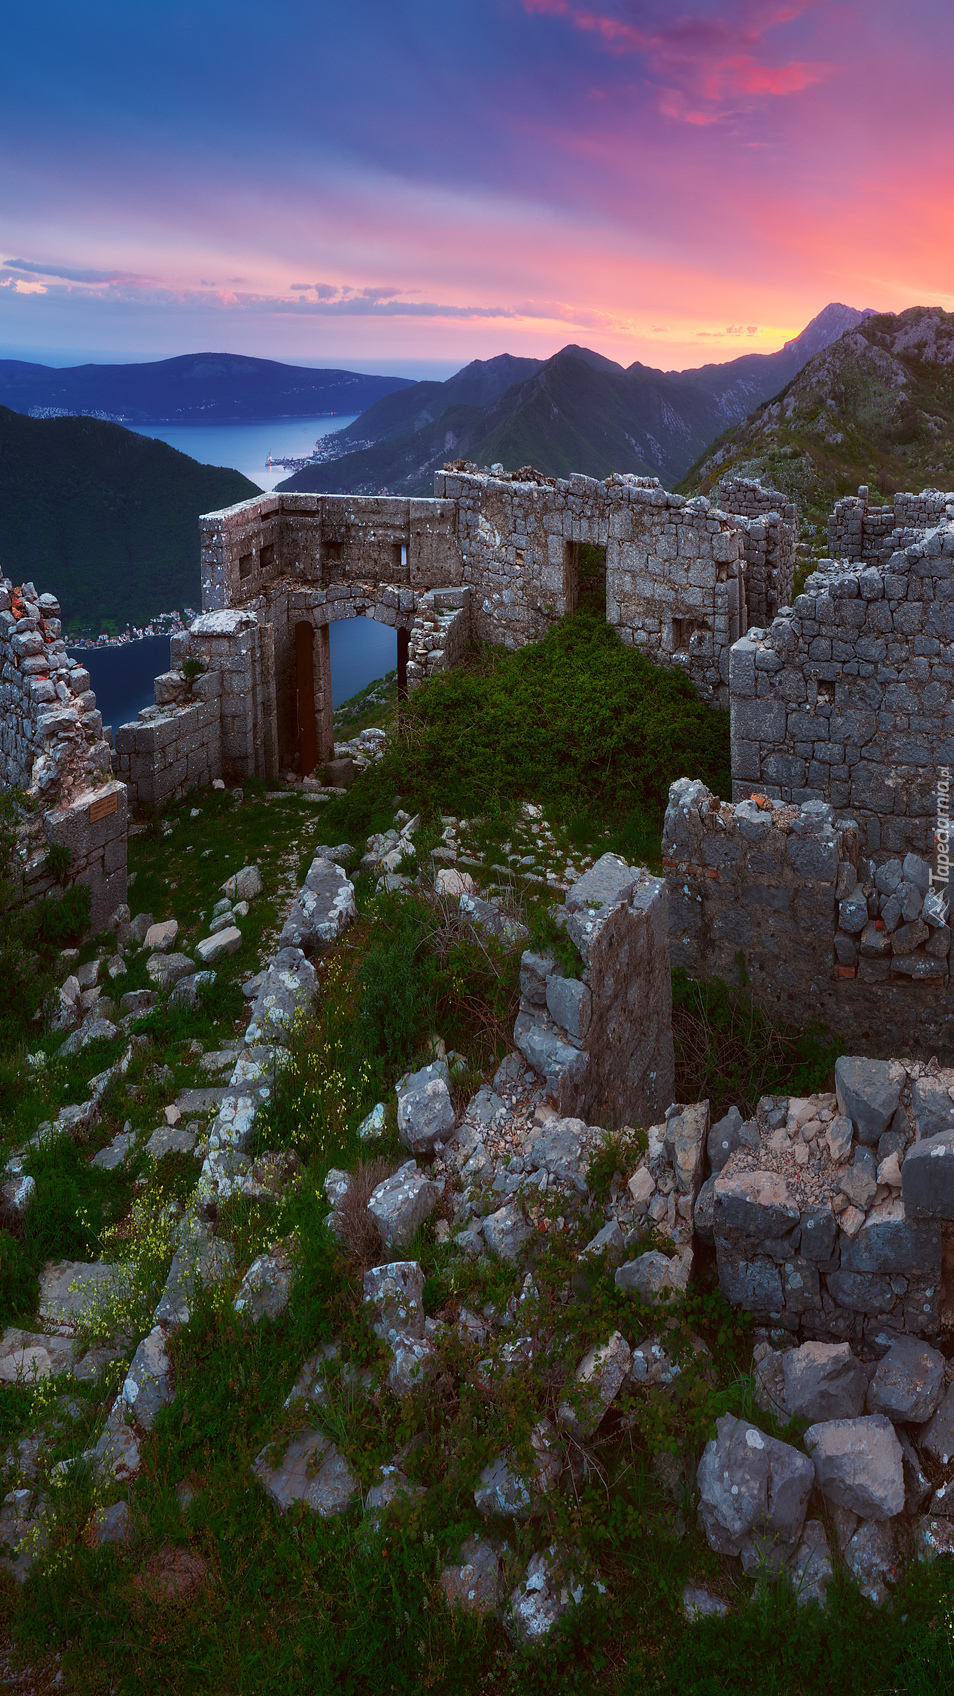 Ruiny nad zatoką Kotorską